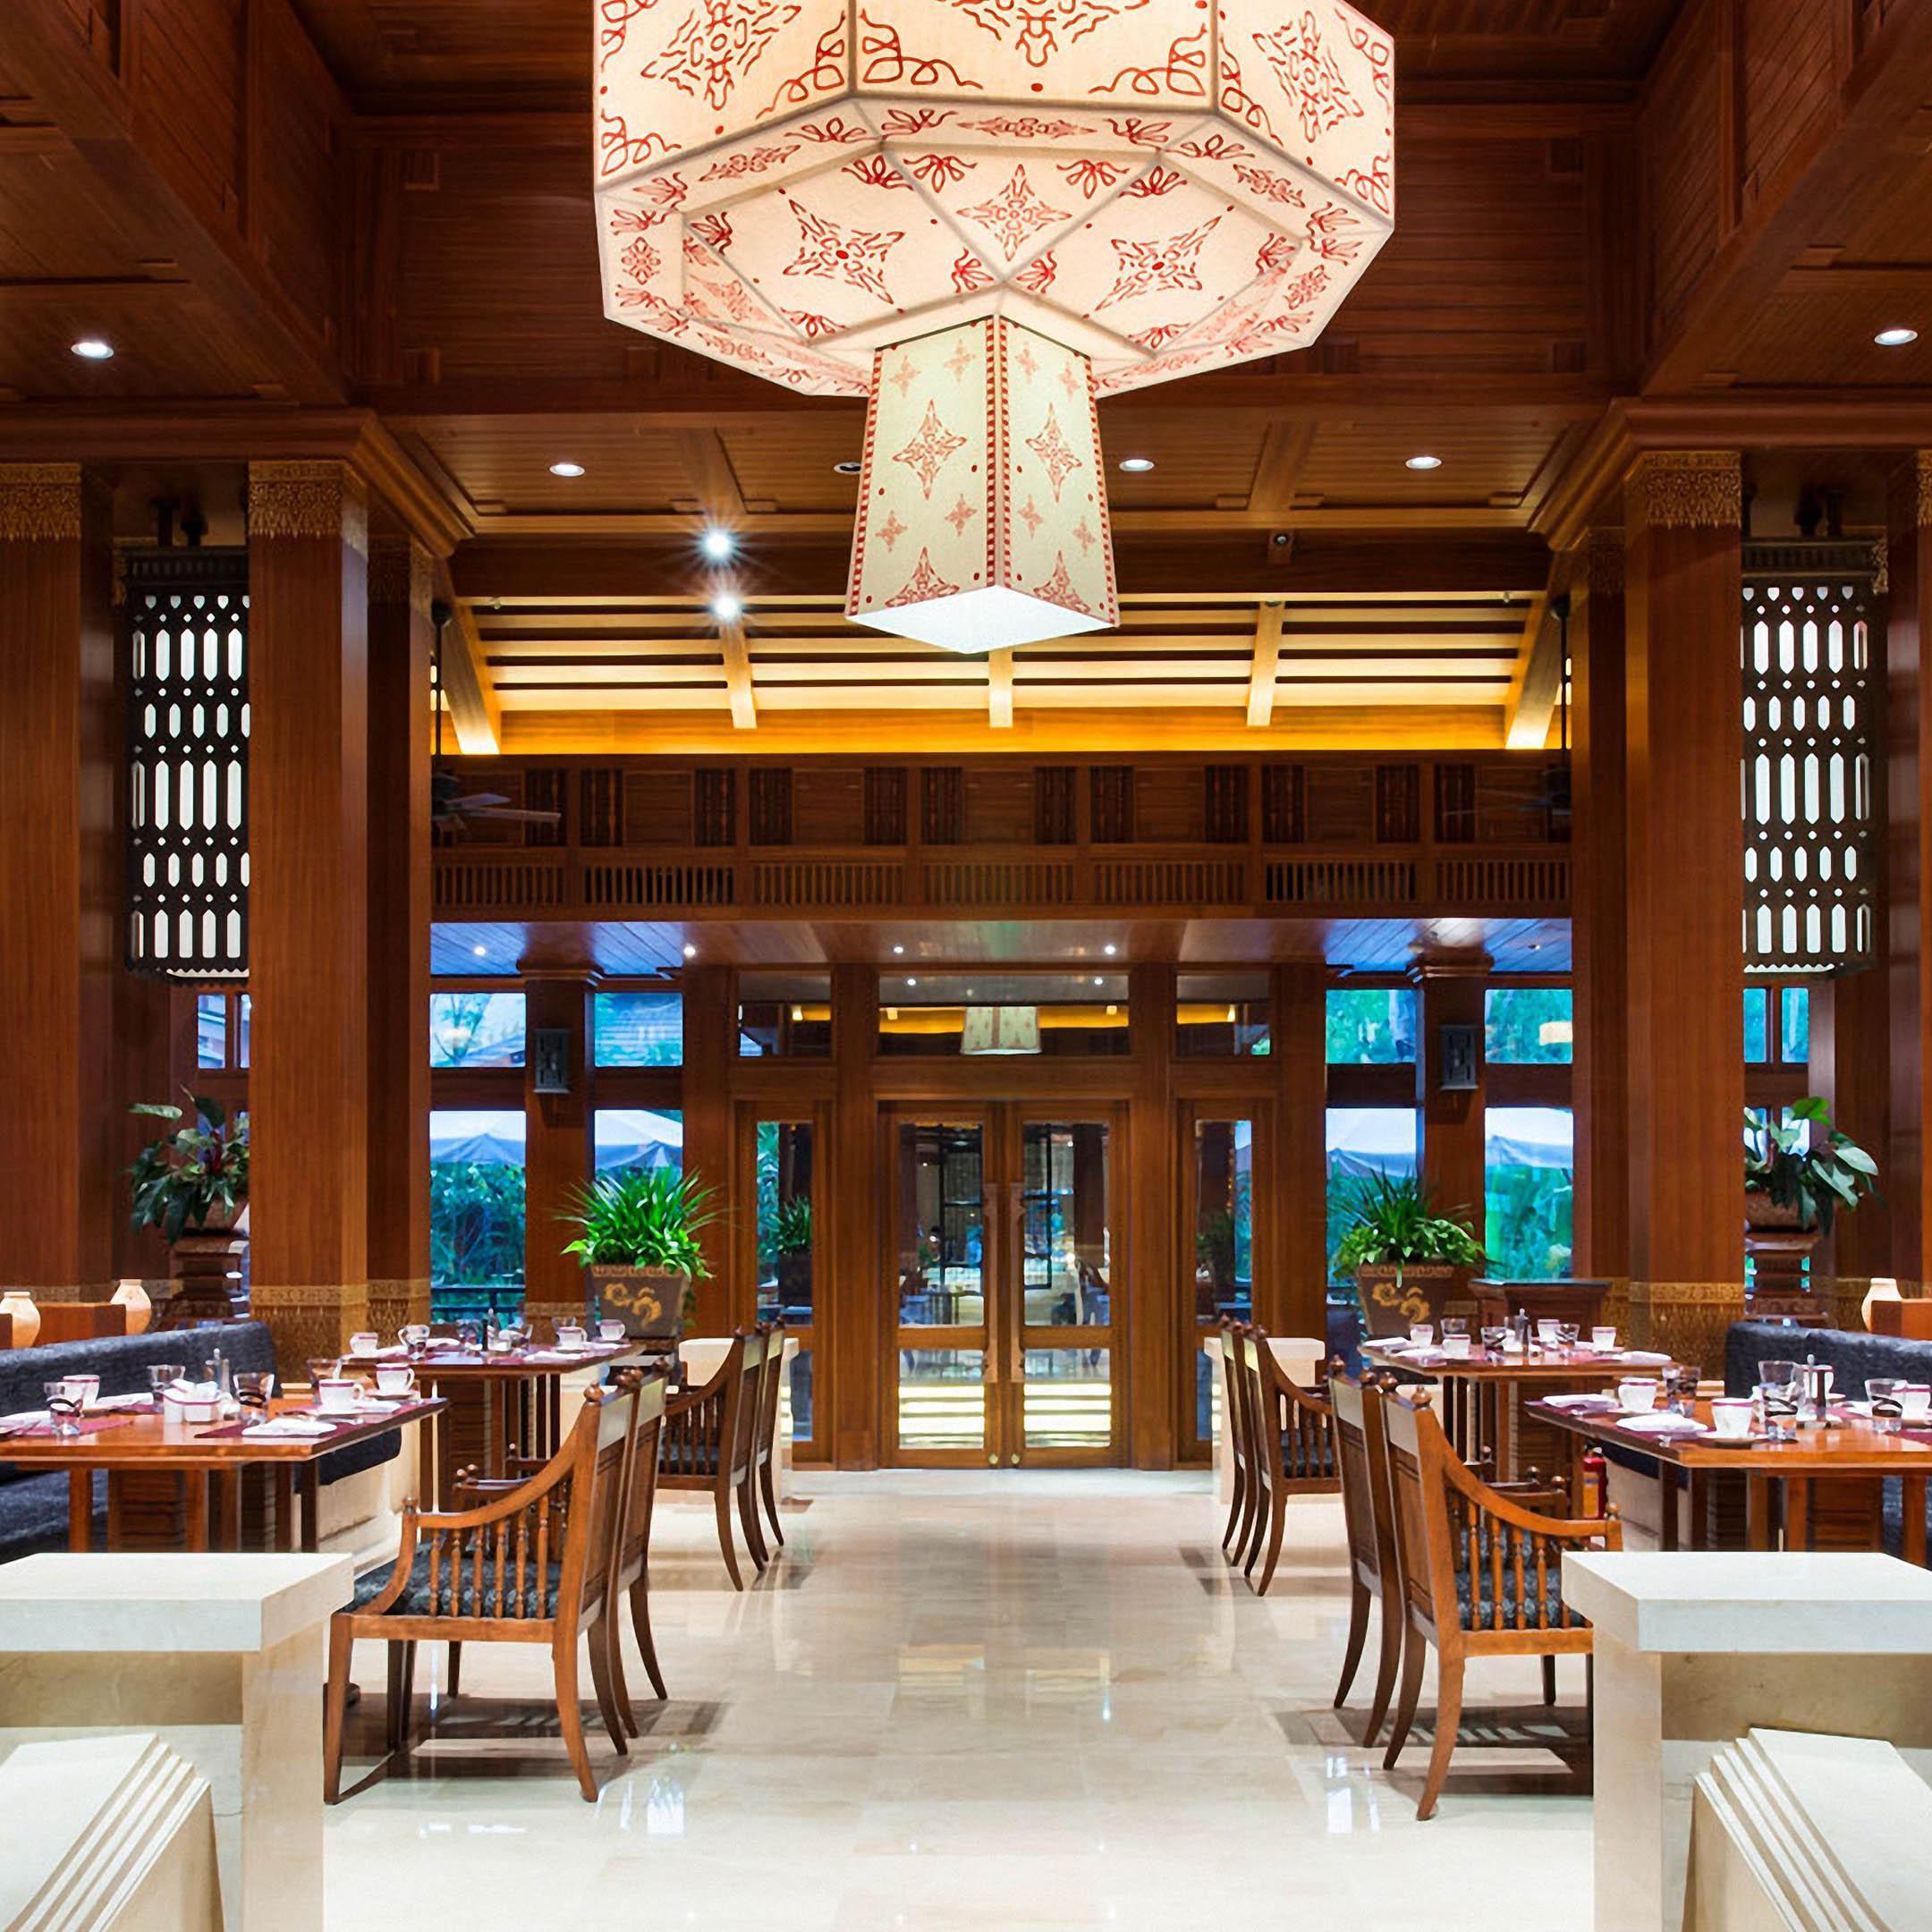 InterContinental Xishuangbanna Resort - Xishuangbanna Yunnan